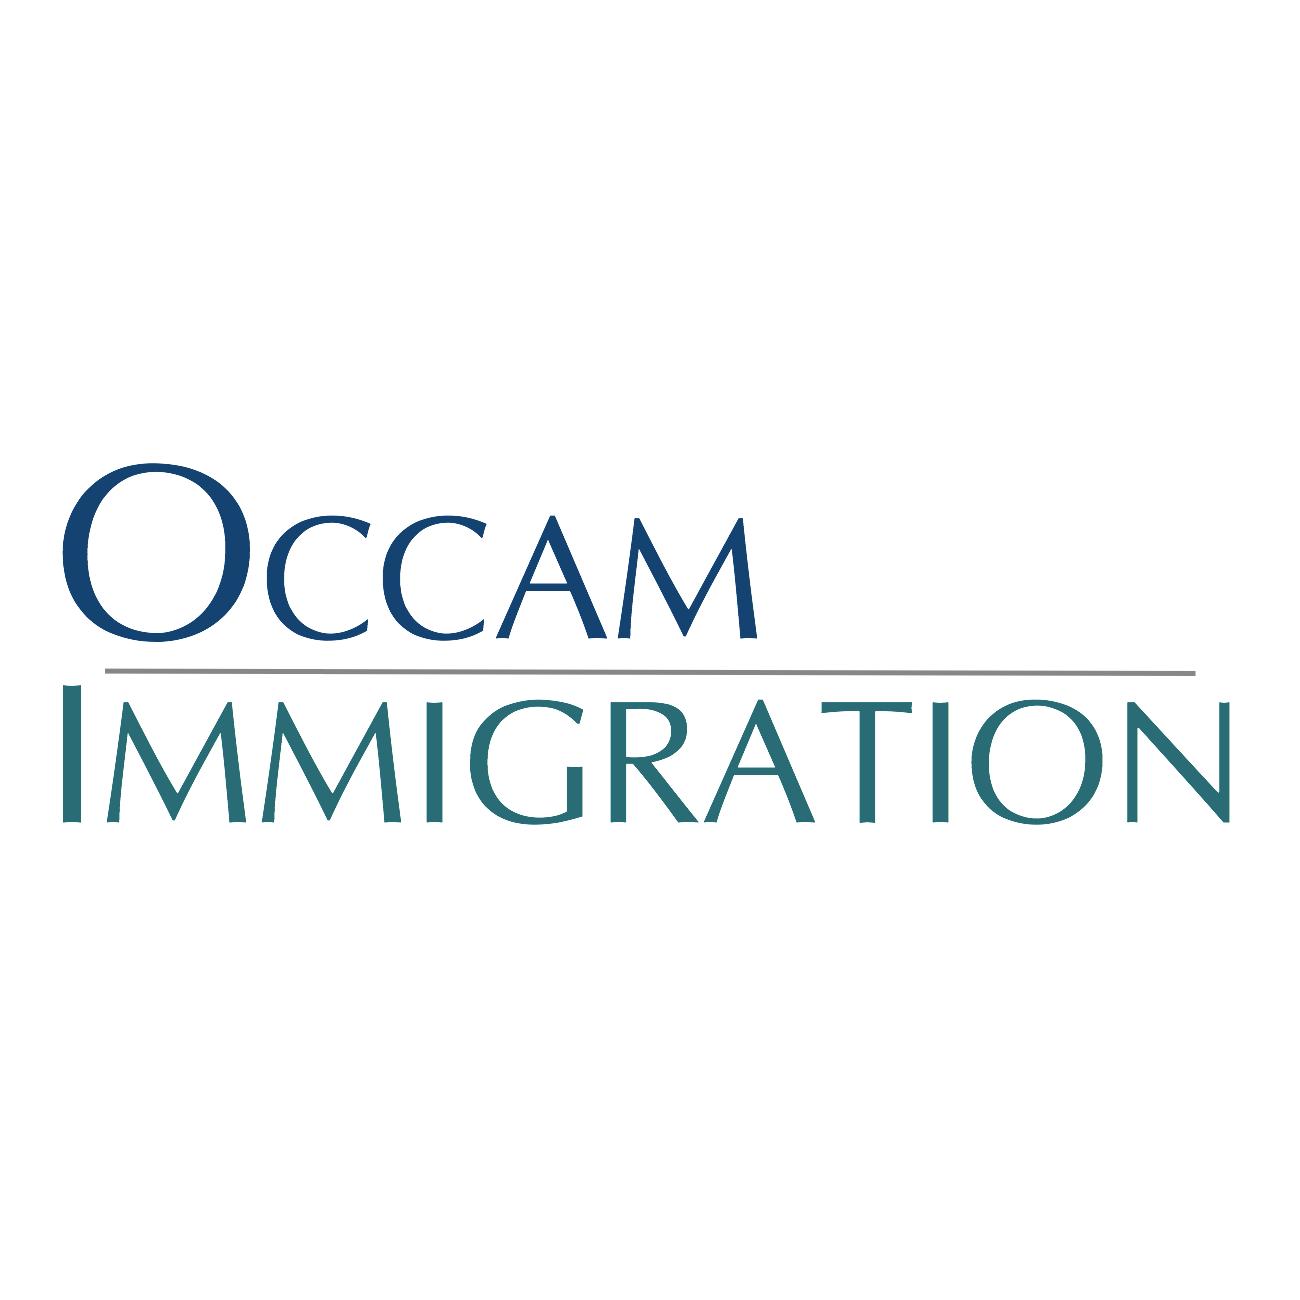 Occam Immigration image 5